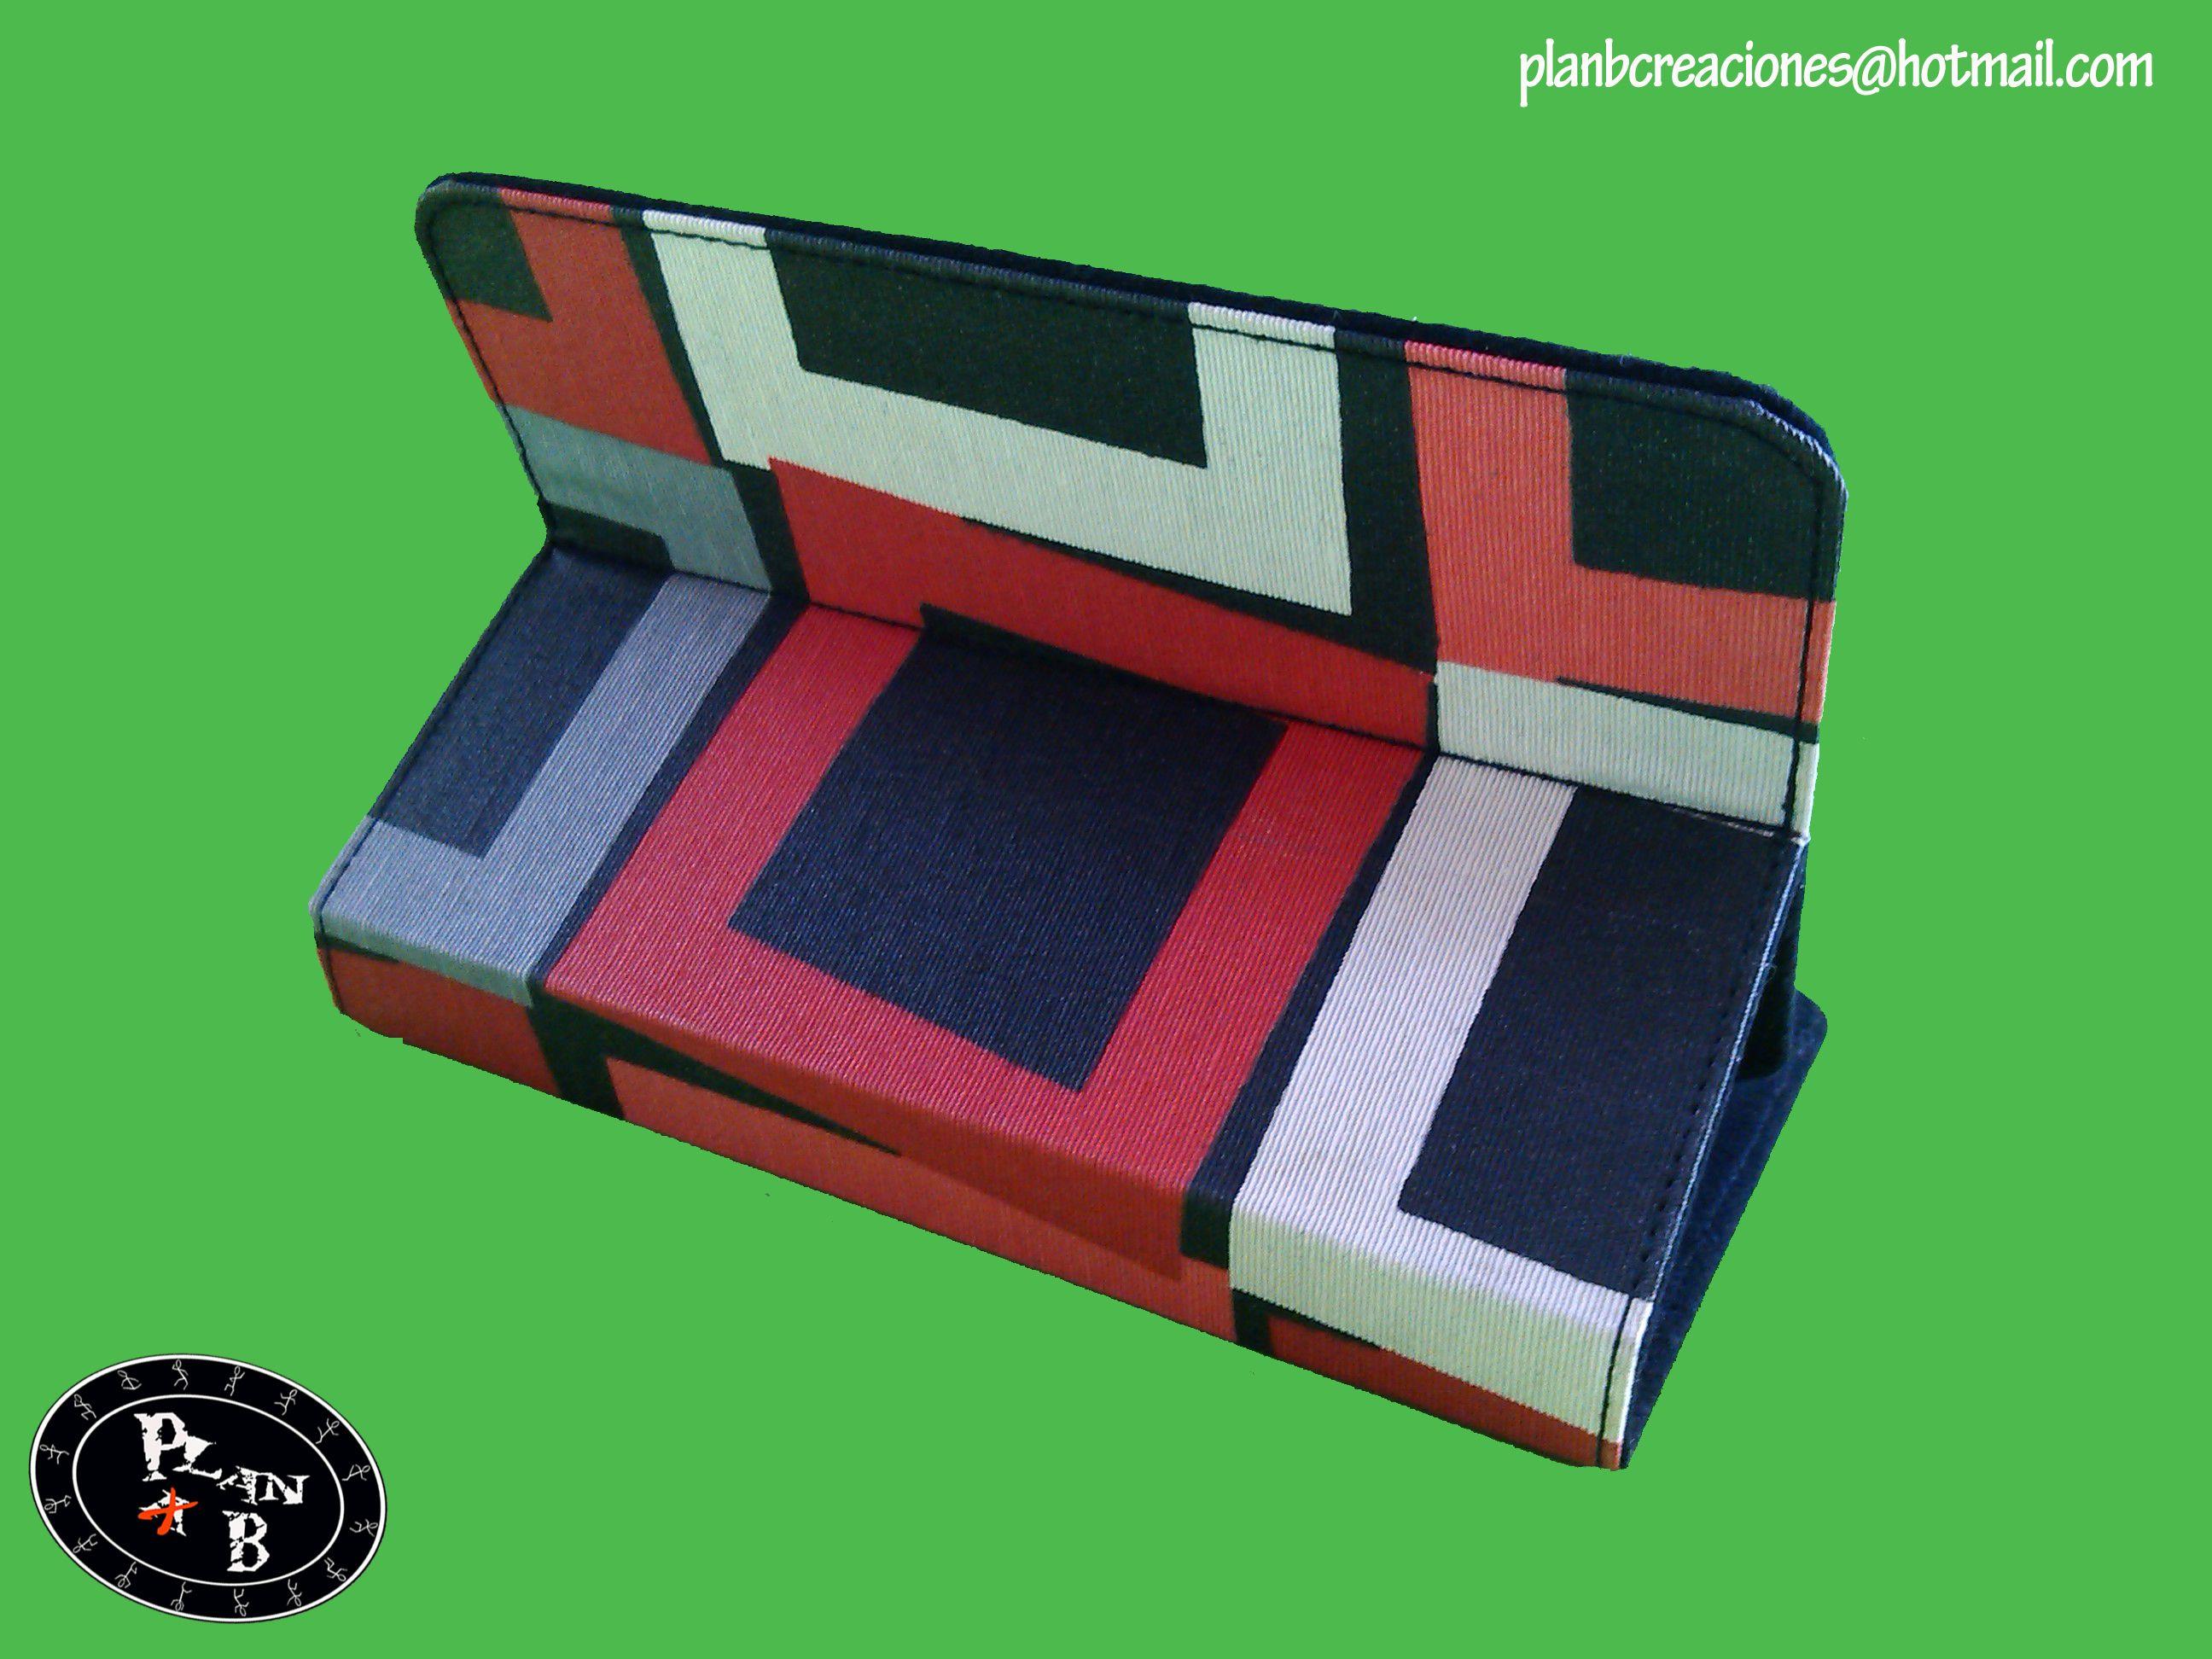 Fundas para tablet 7 pulgadas Plan B, modelo Elegance